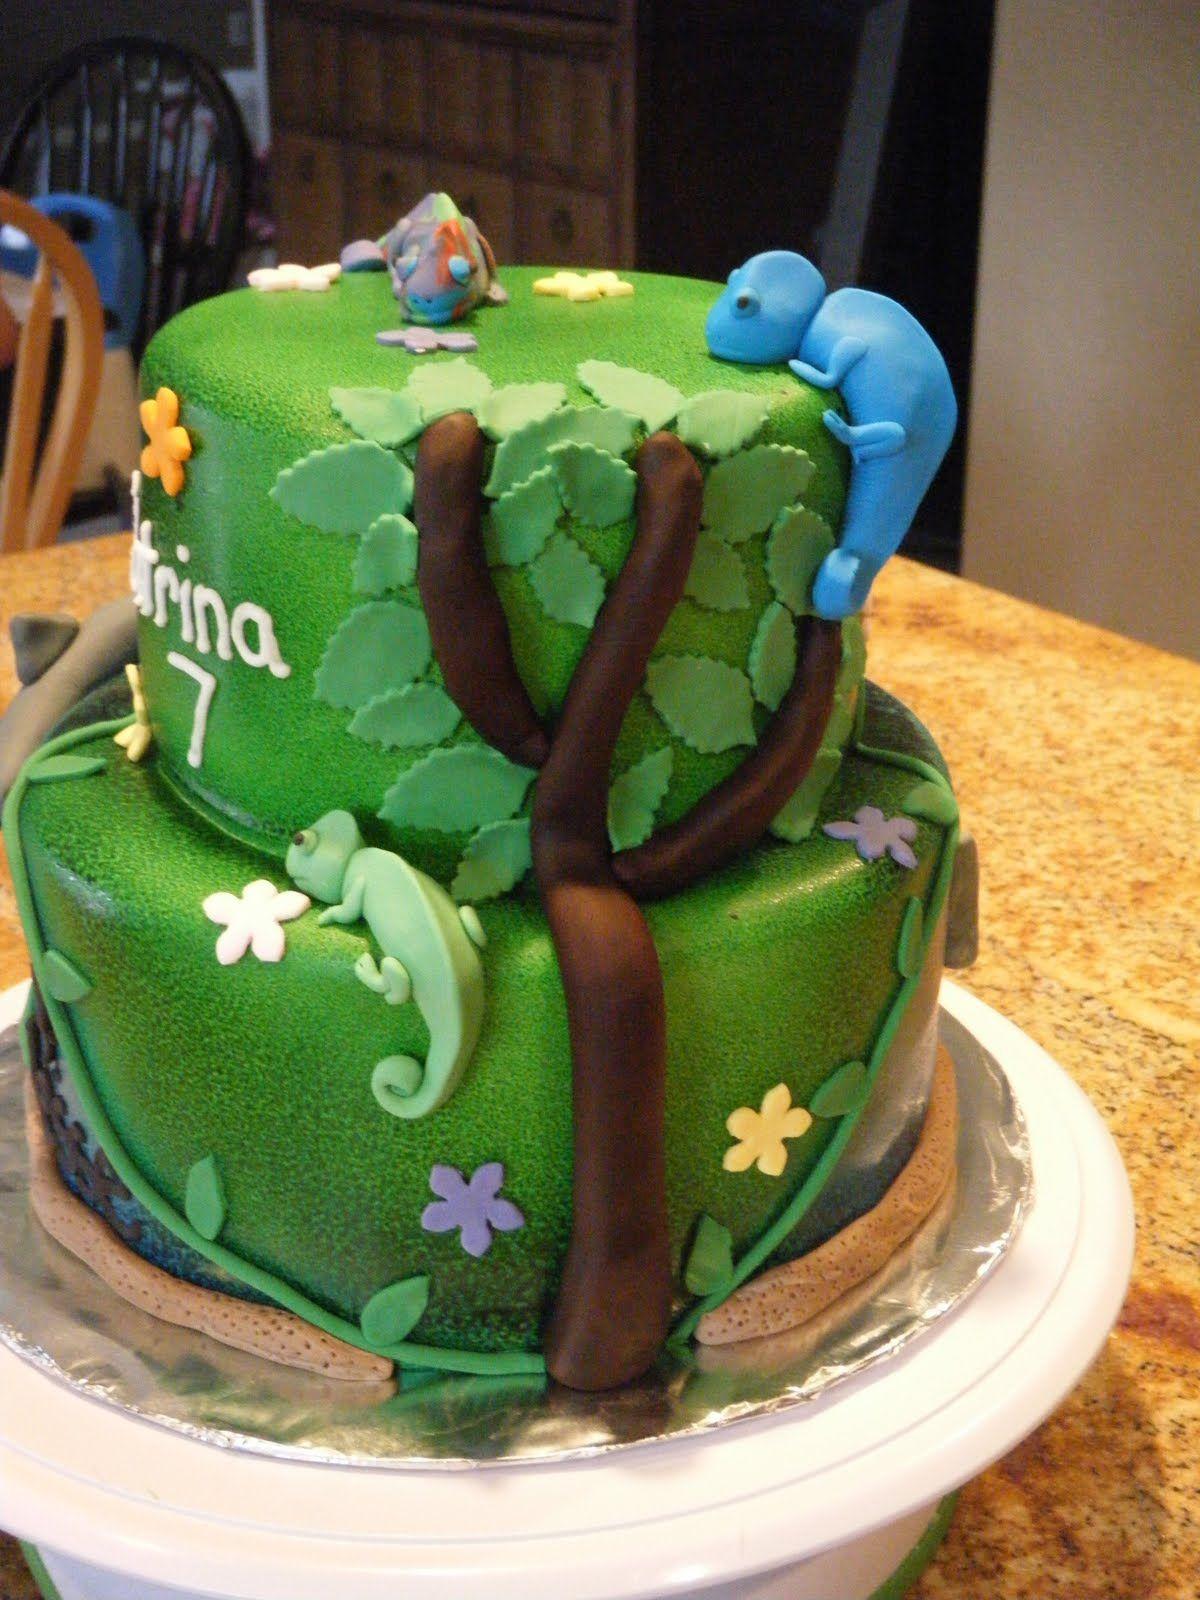 Pin Chameleon Cake Cake On Pinterest Cake Boy Birthday Cake Decadent Chocolate